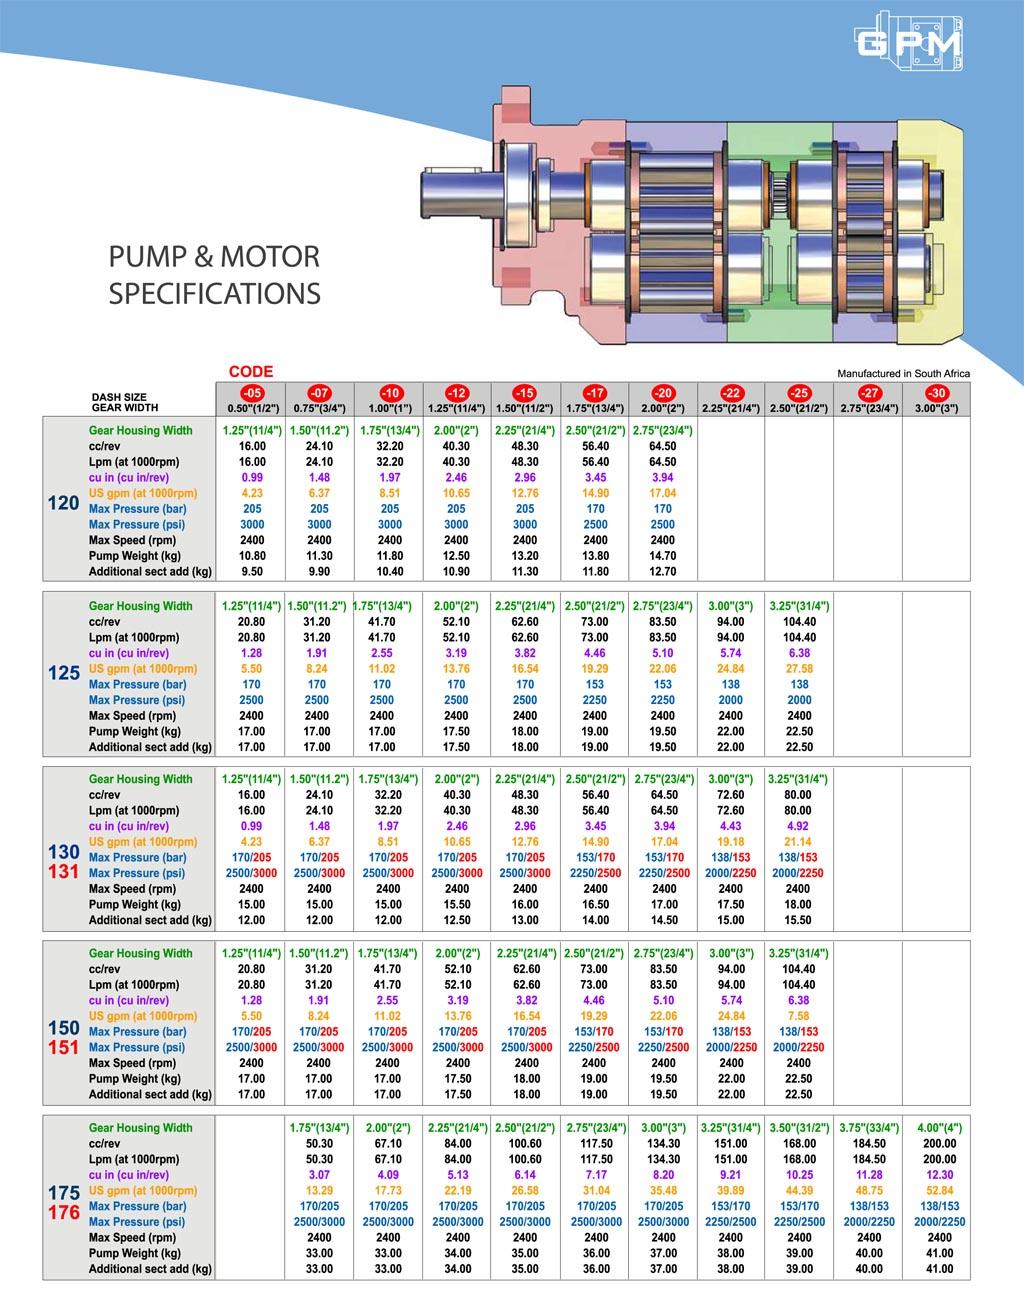 GPM Bearing Pump & Motor Specfications